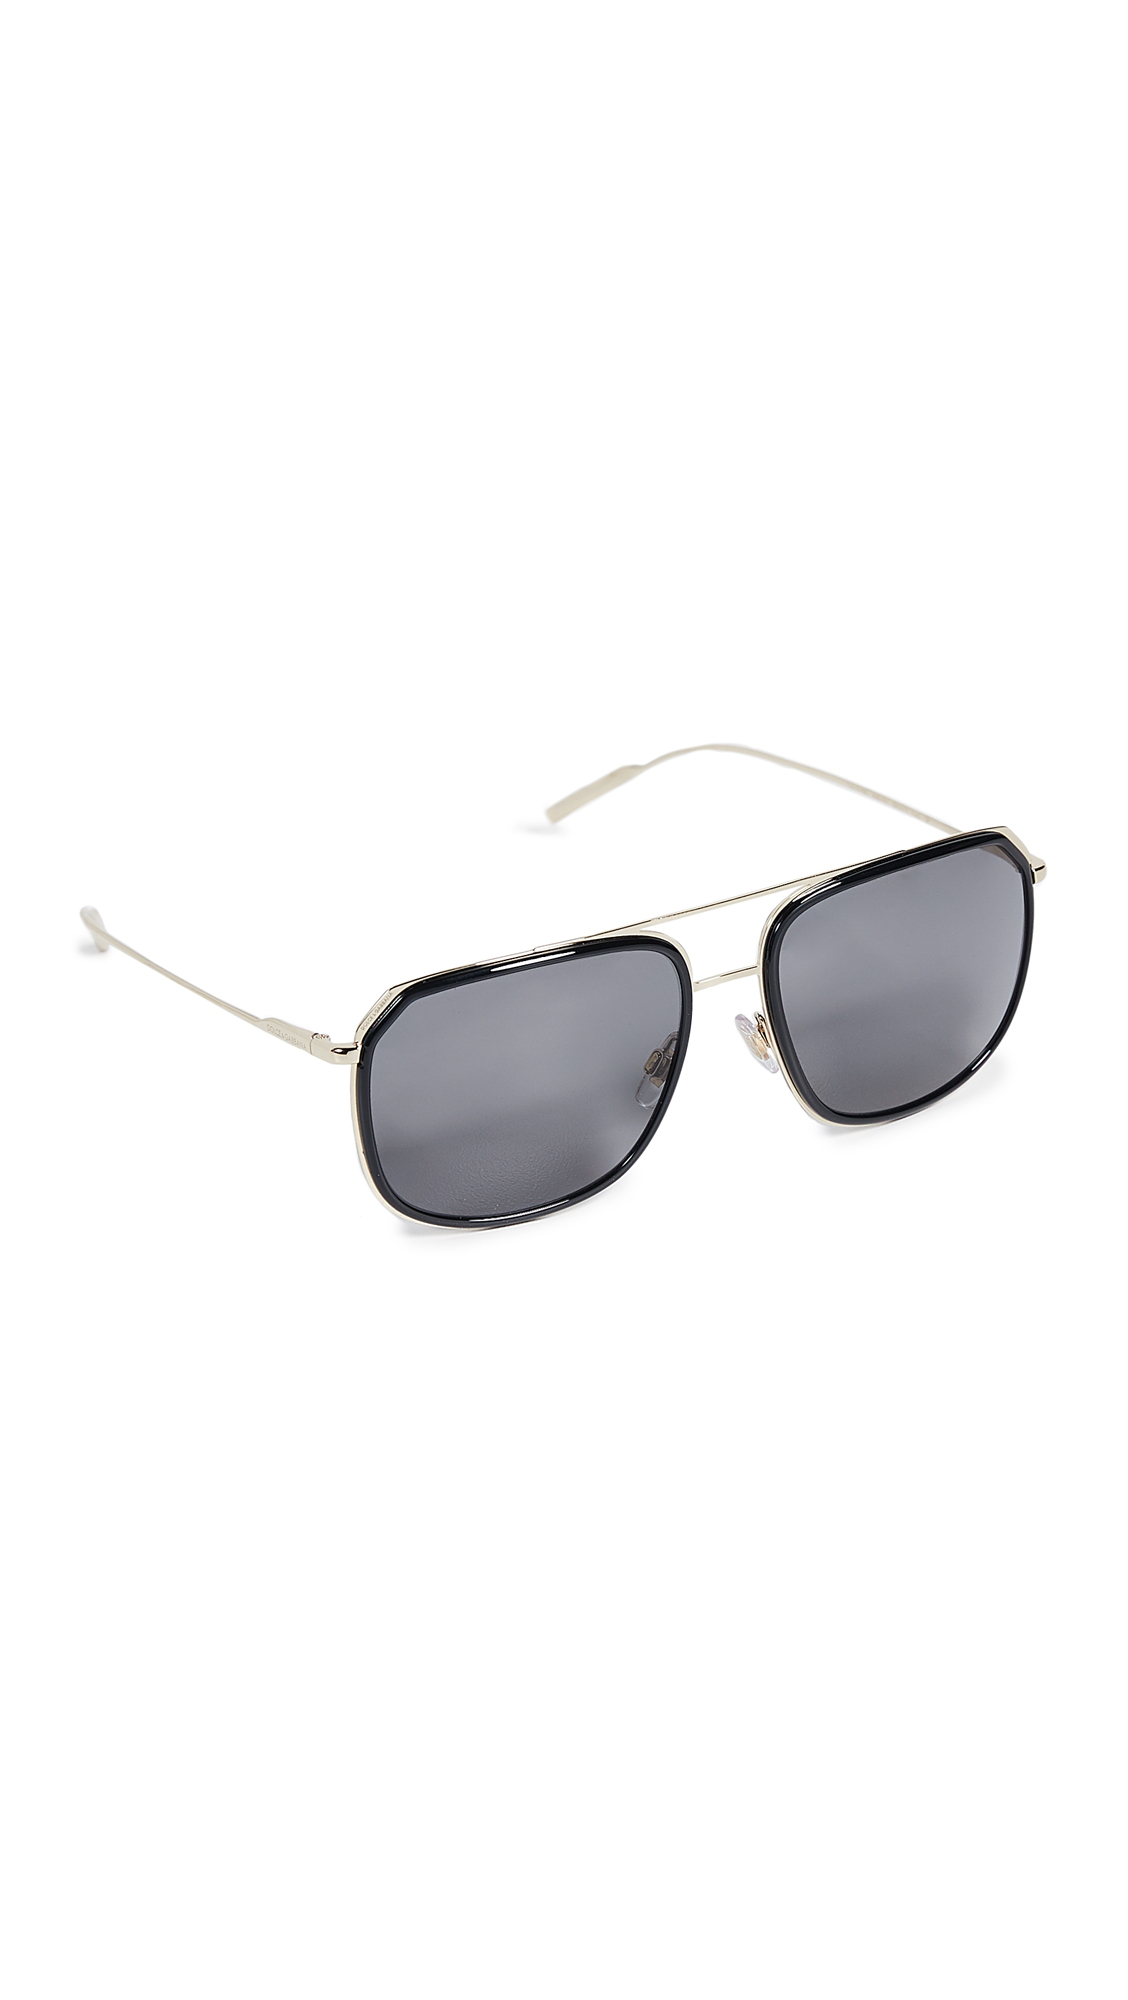 91defbd4c8 Dolce   Gabbana Dg2165 Polarized Sunglasses In Black Pale Gold Grey ...